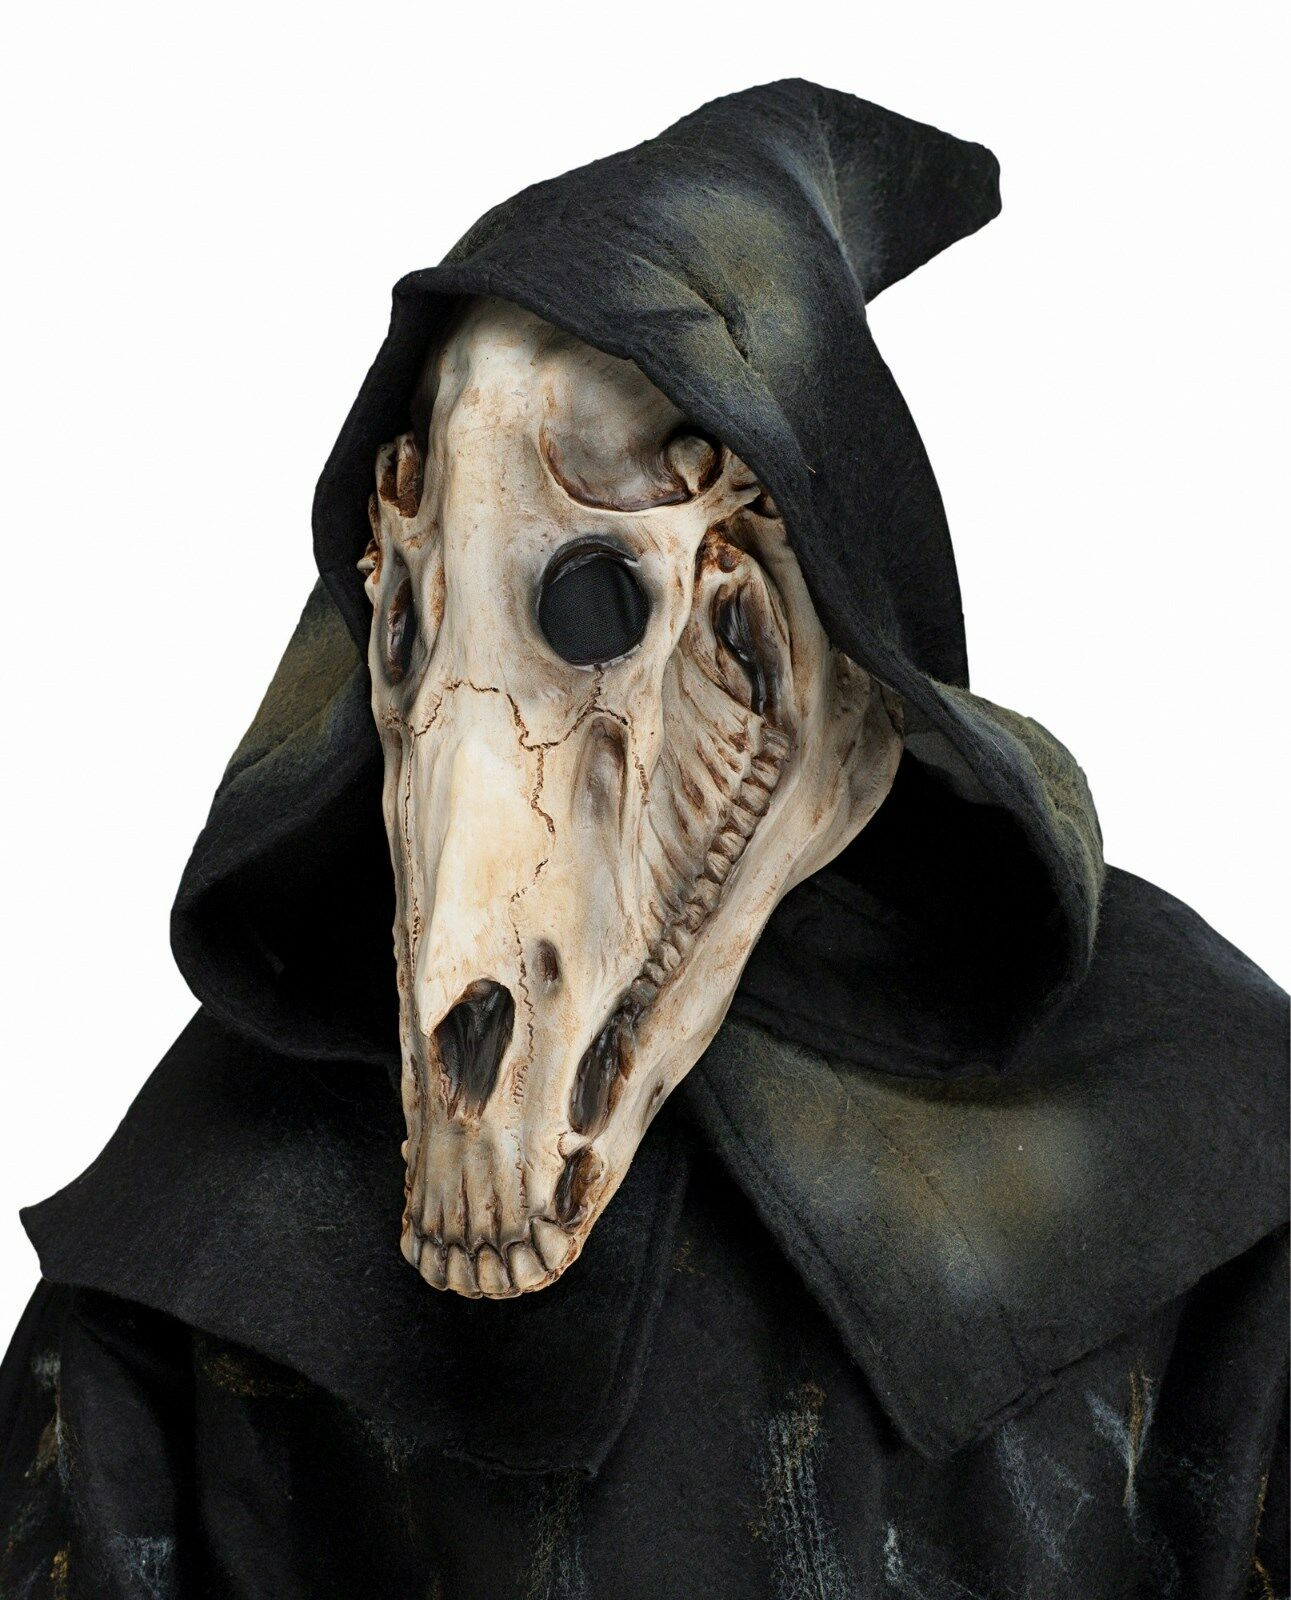 Horse Mask - Latex Rubber Unicorn Horse Animal Head Mask Costume ...